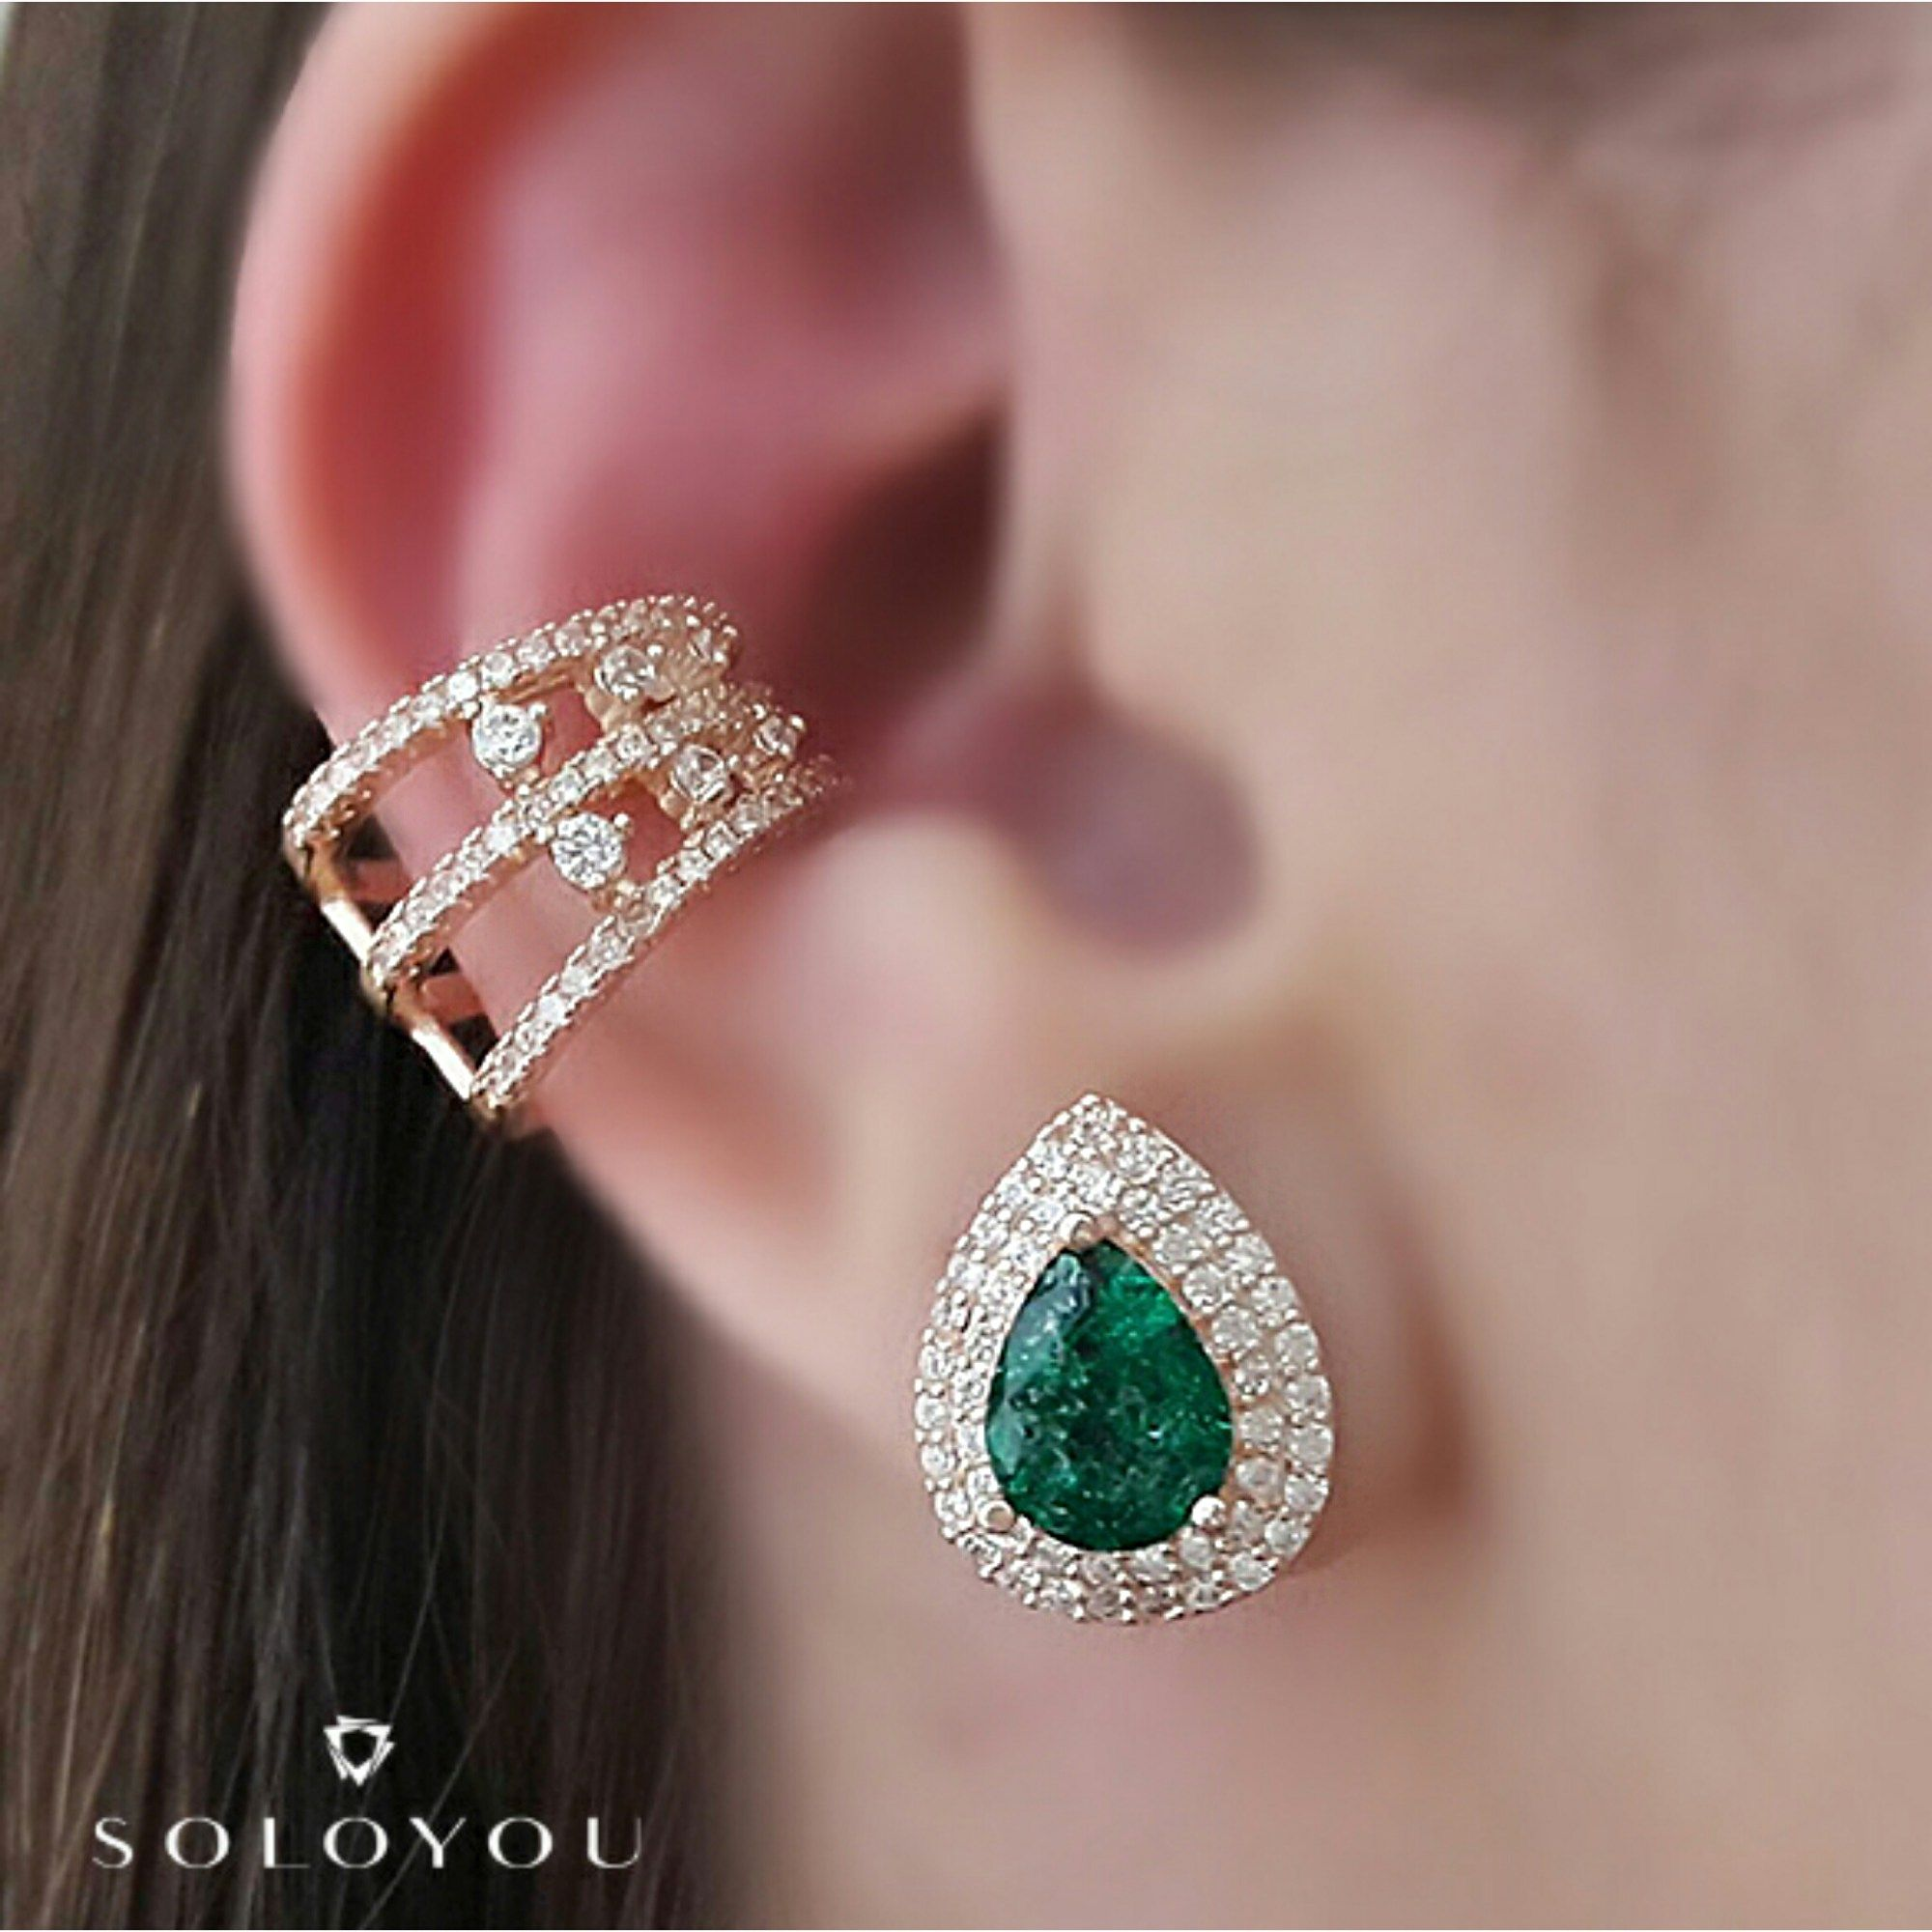 Piercing Falso Ouro Rosa Zircônia Cristal Semijoia de Luxo  - SOLOYOU